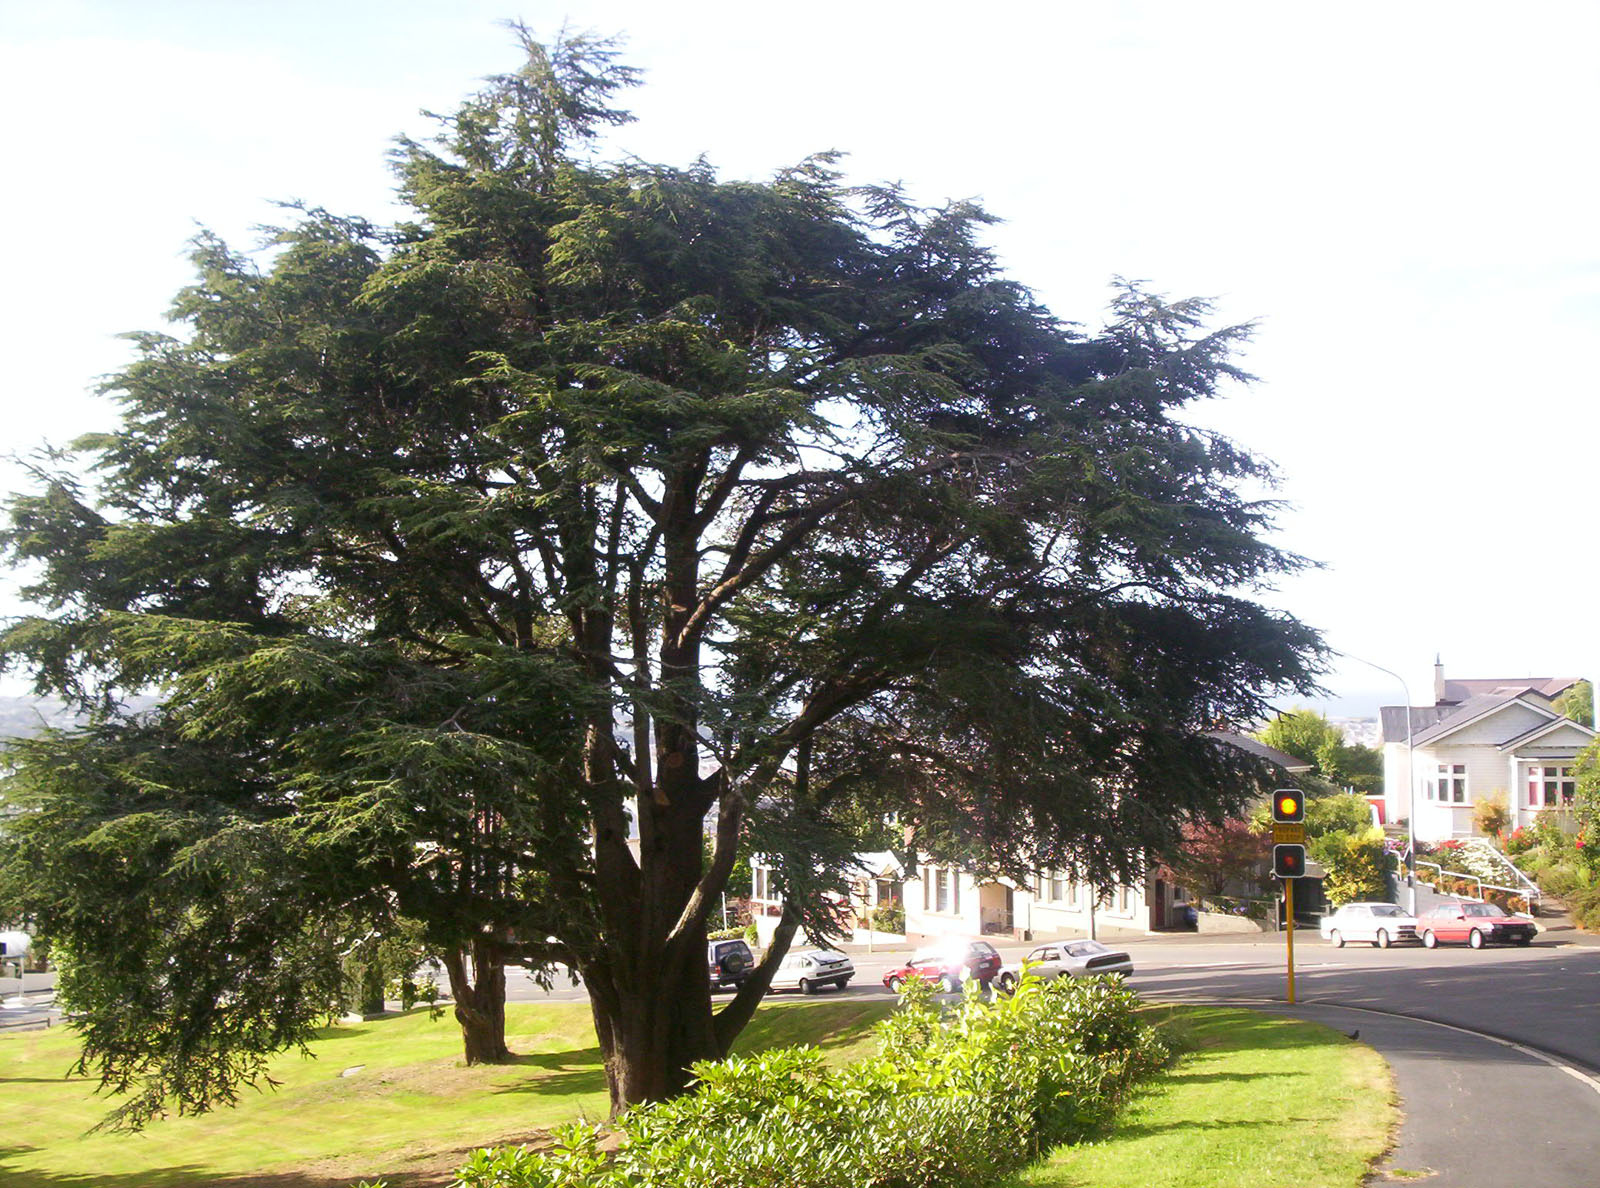 Old Tree, Arthur, Branches, Bspo06, Cones, HQ Photo